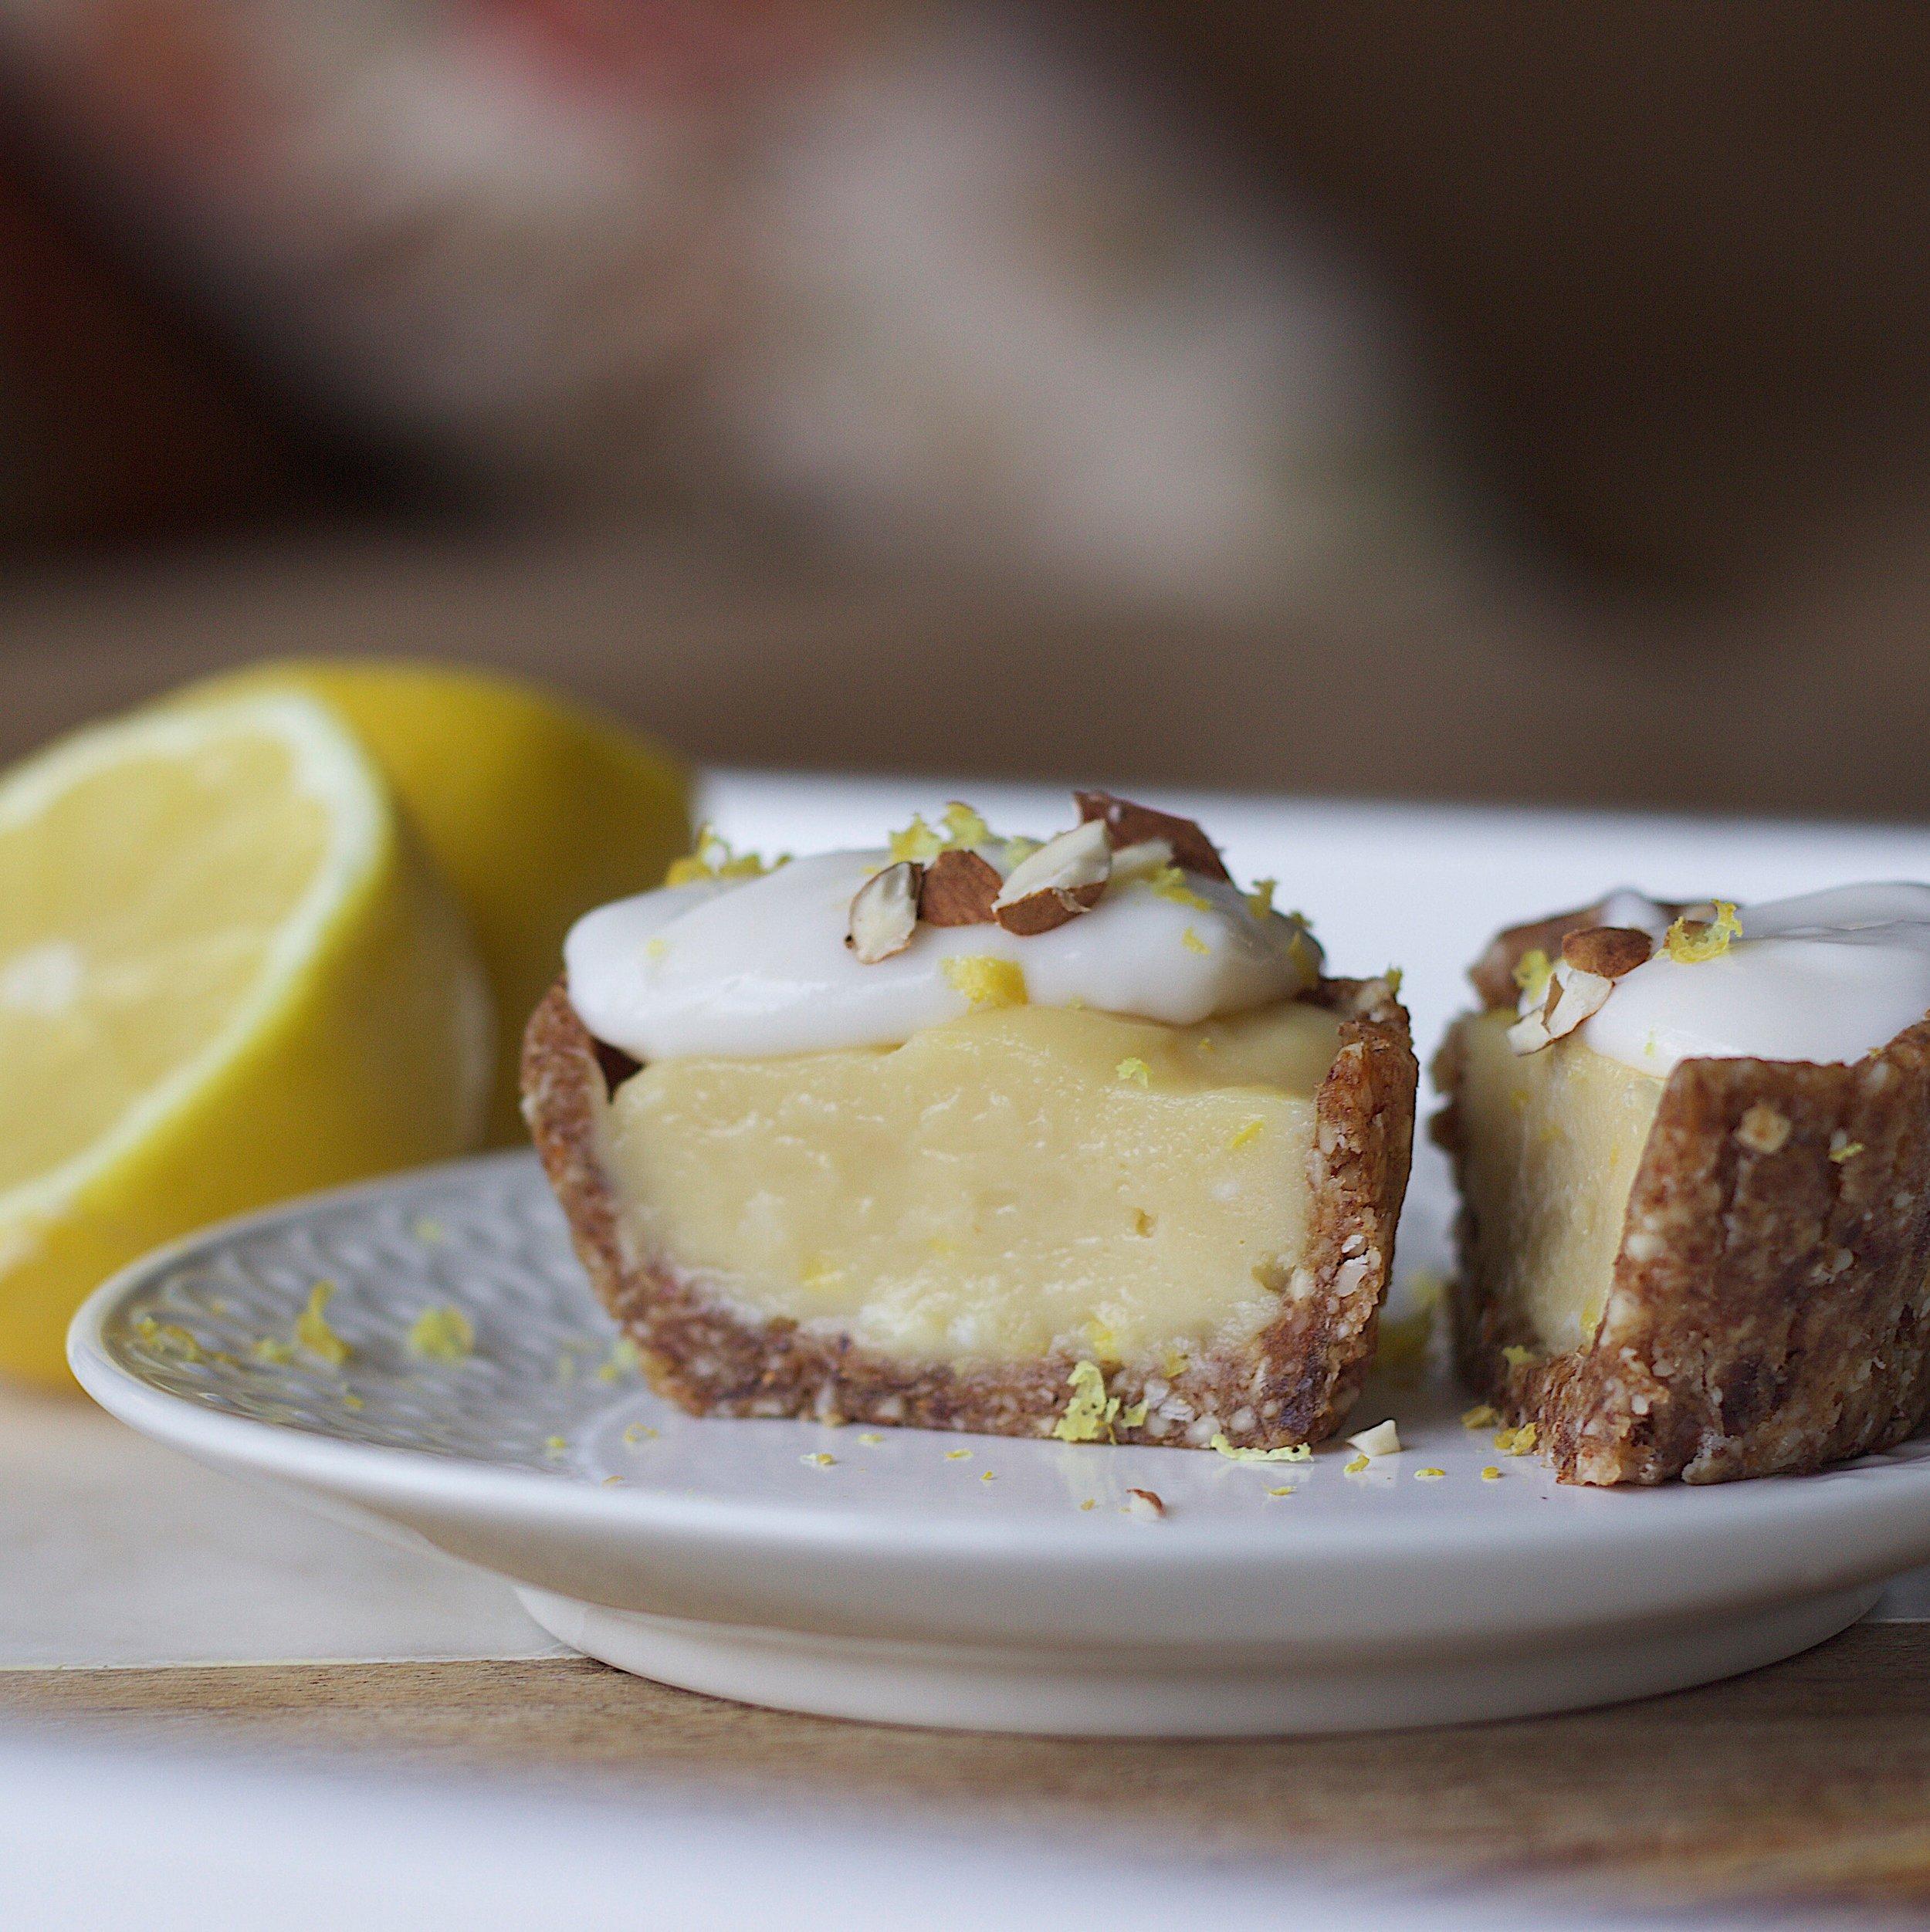 Creamy Lemon Almond Tart